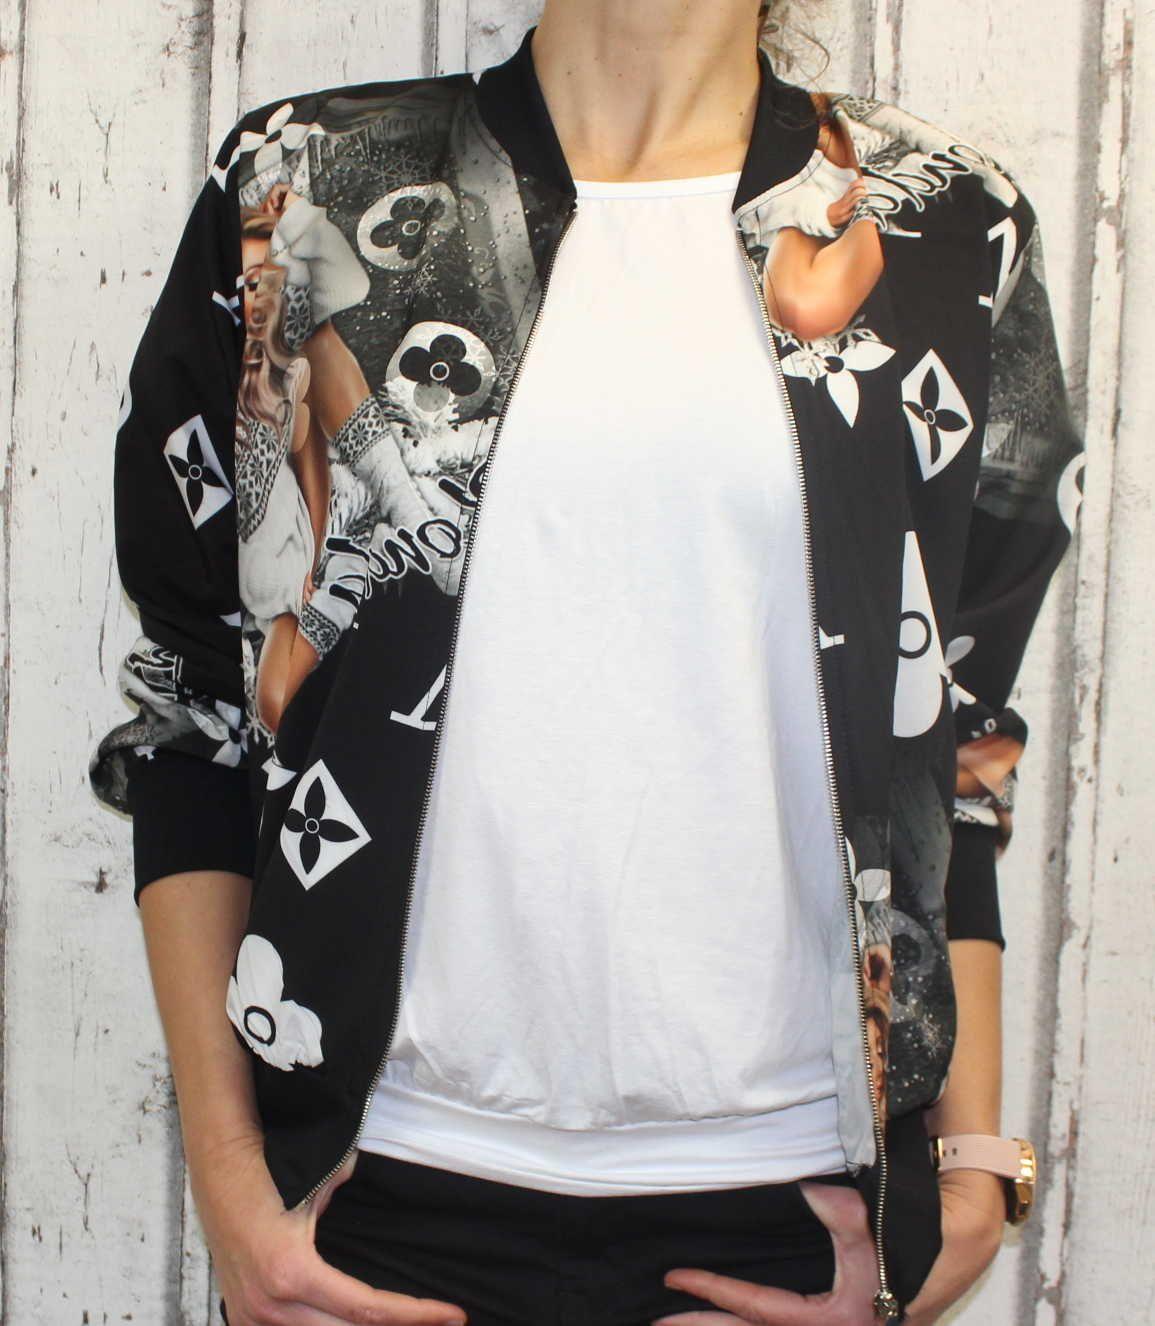 dámská letní bunda, lehká bundička, slabá bunda, jarní bunda, dámská lehká bunda, dámská slabá bundička